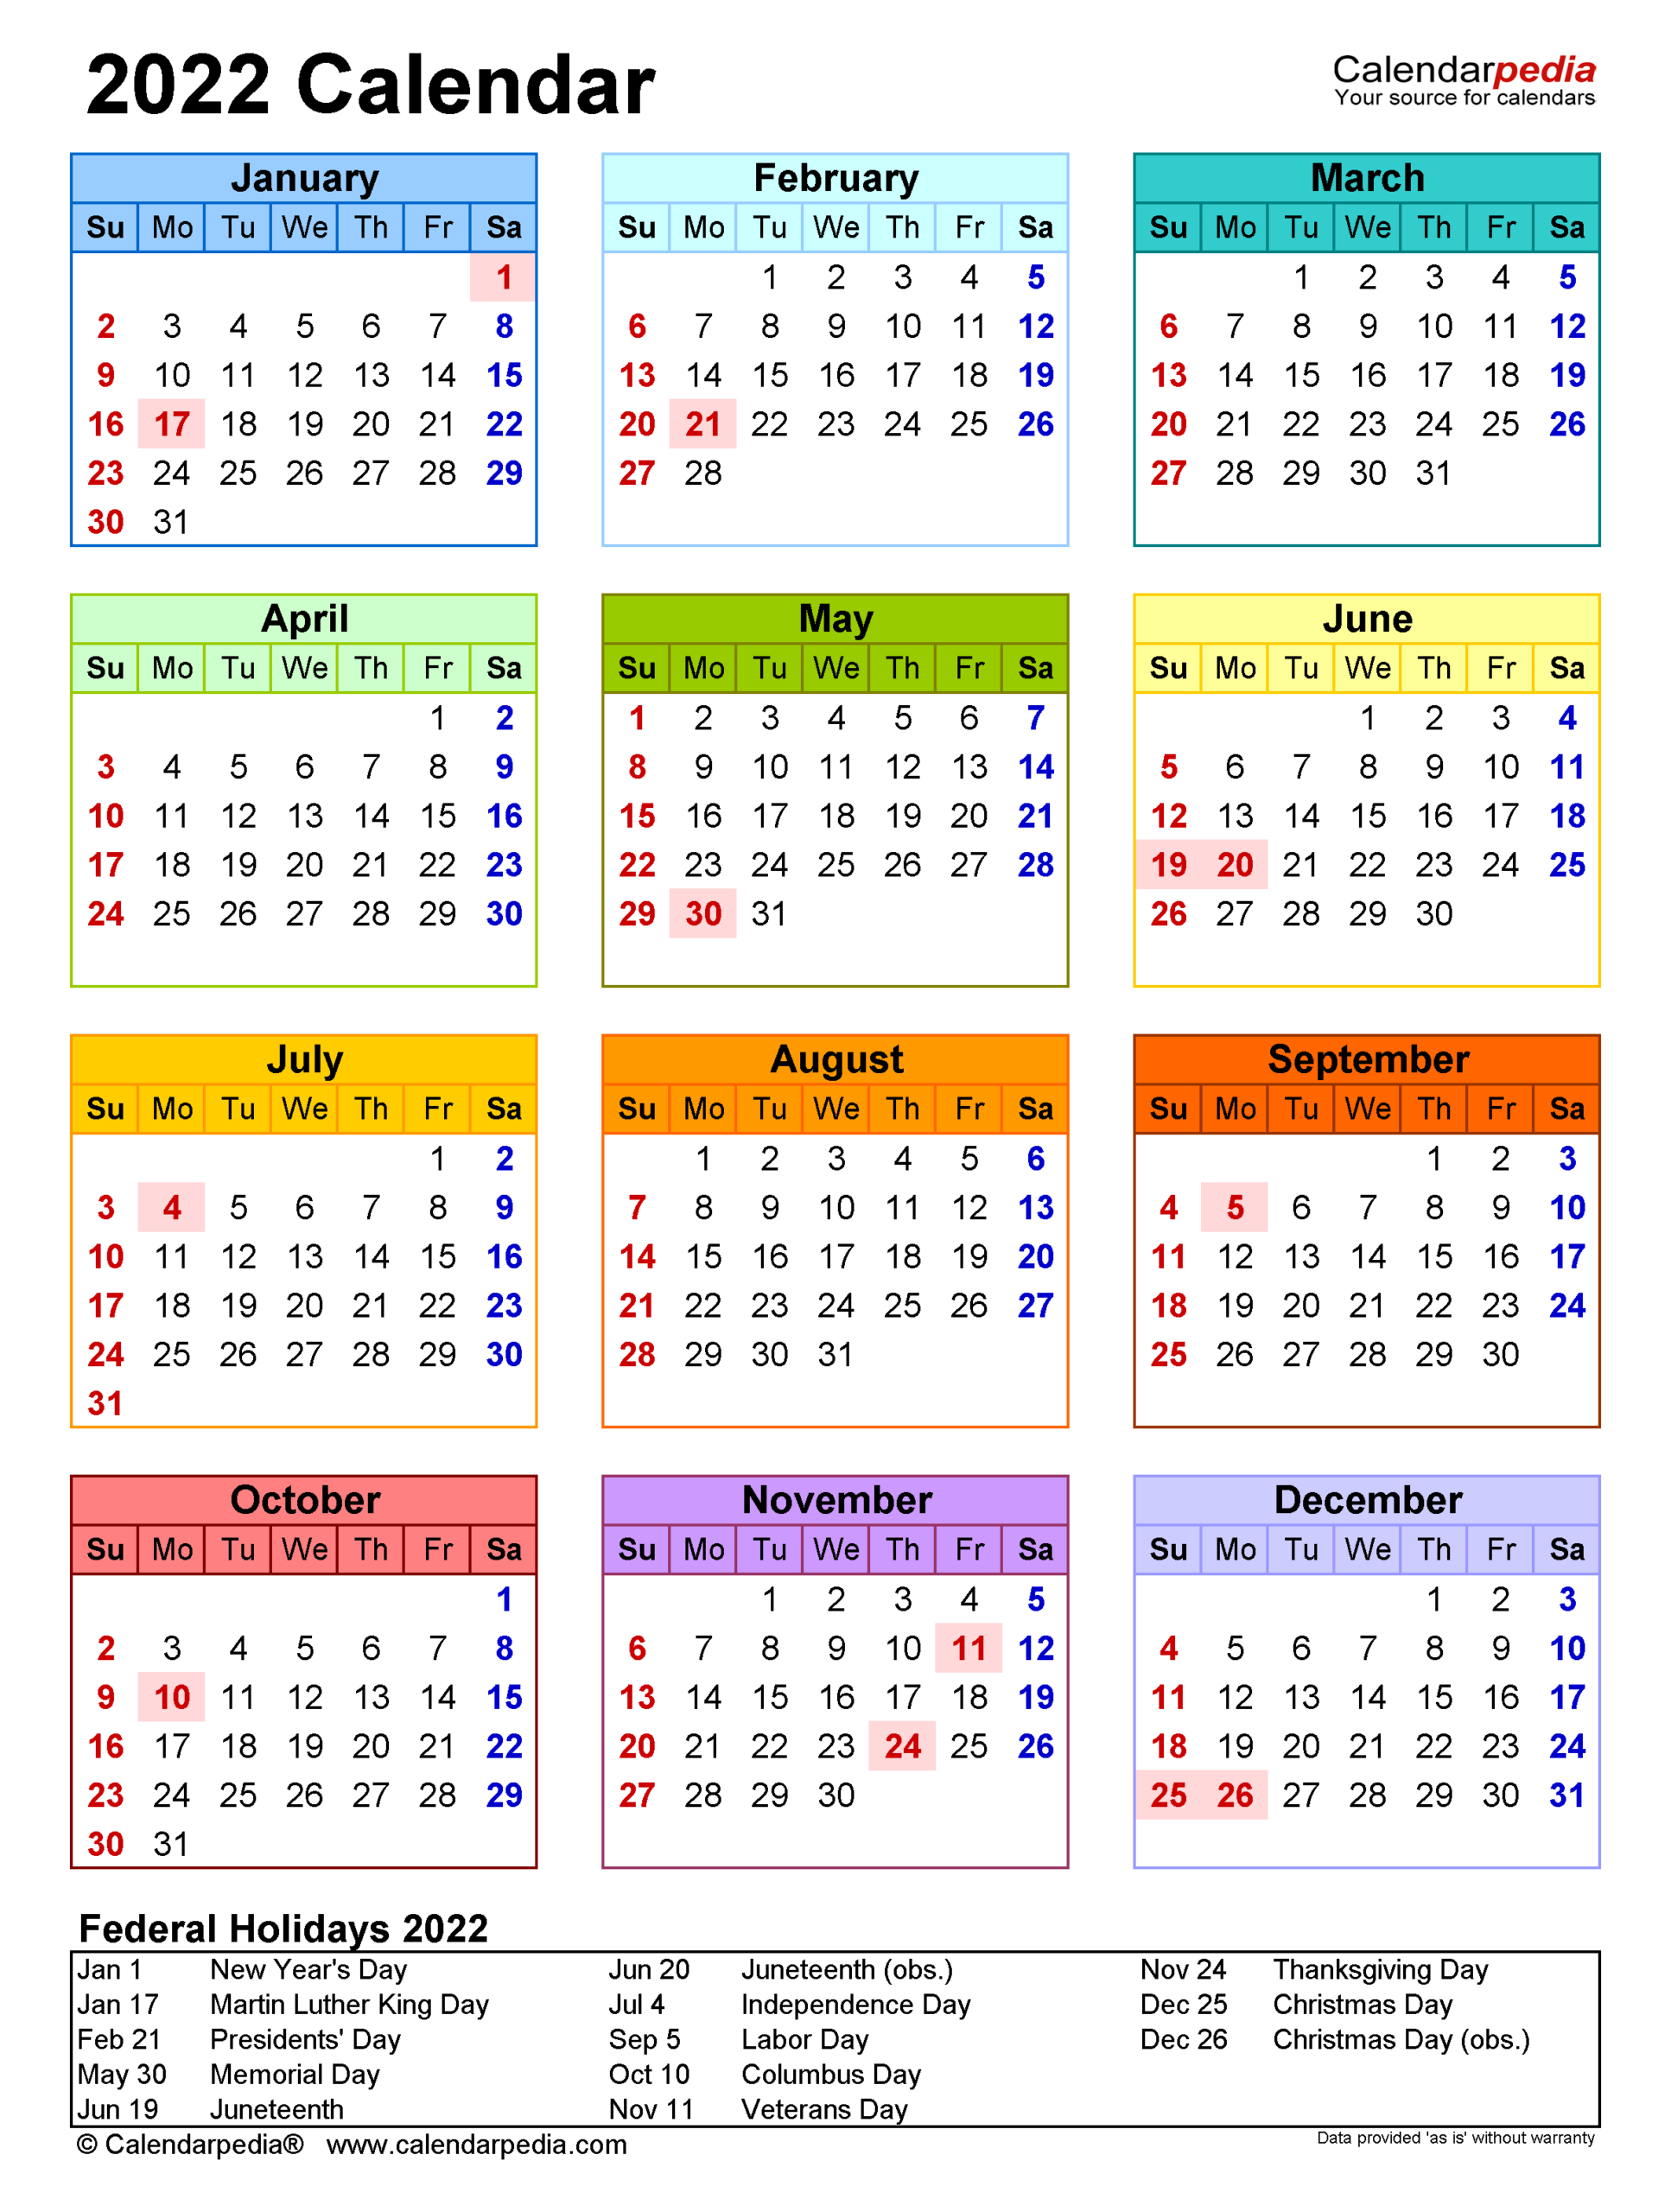 2022 Calendar - Free Printable Excel Templates - Calendarpedia intended for Print July 2022 Ckander Photo